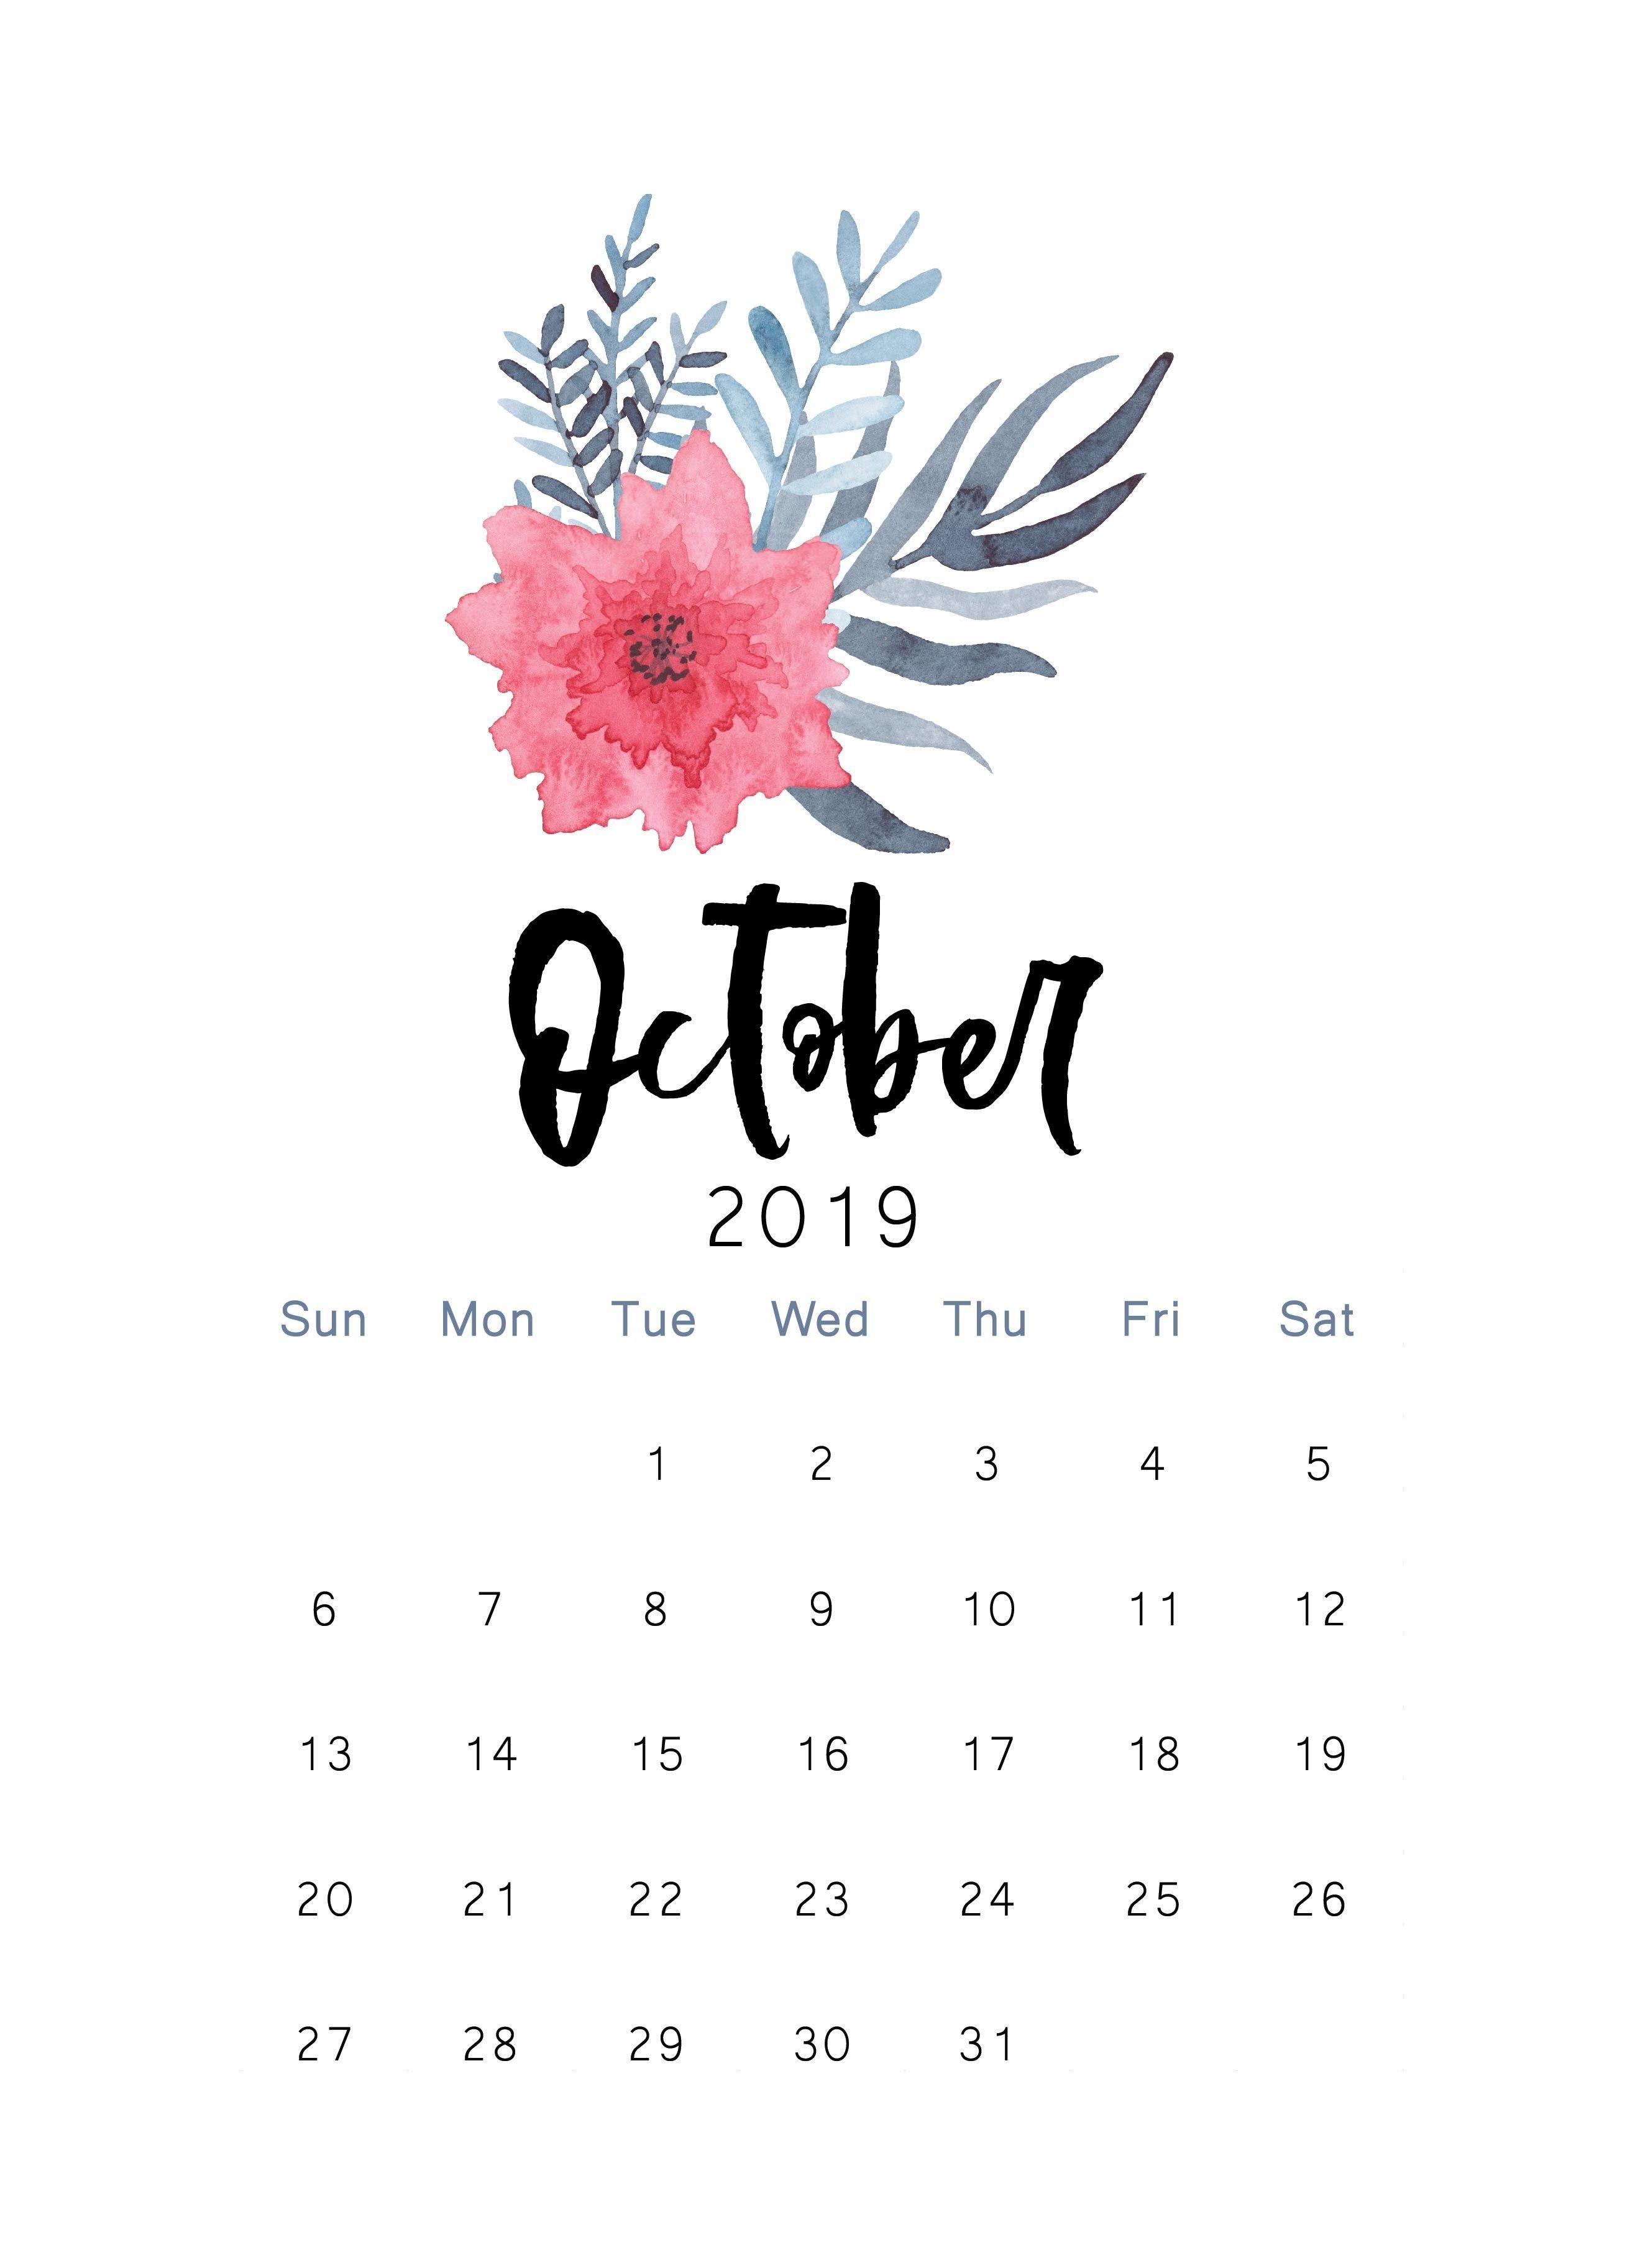 Calendario 2019 Imprimir A4 Más Populares Free 2019 Printable Calendar Col Of Calendario 2019 Imprimir A4 Más Arriba-a-fecha C³mo Imprimir Un Calendario De Ipad 18 Pasos